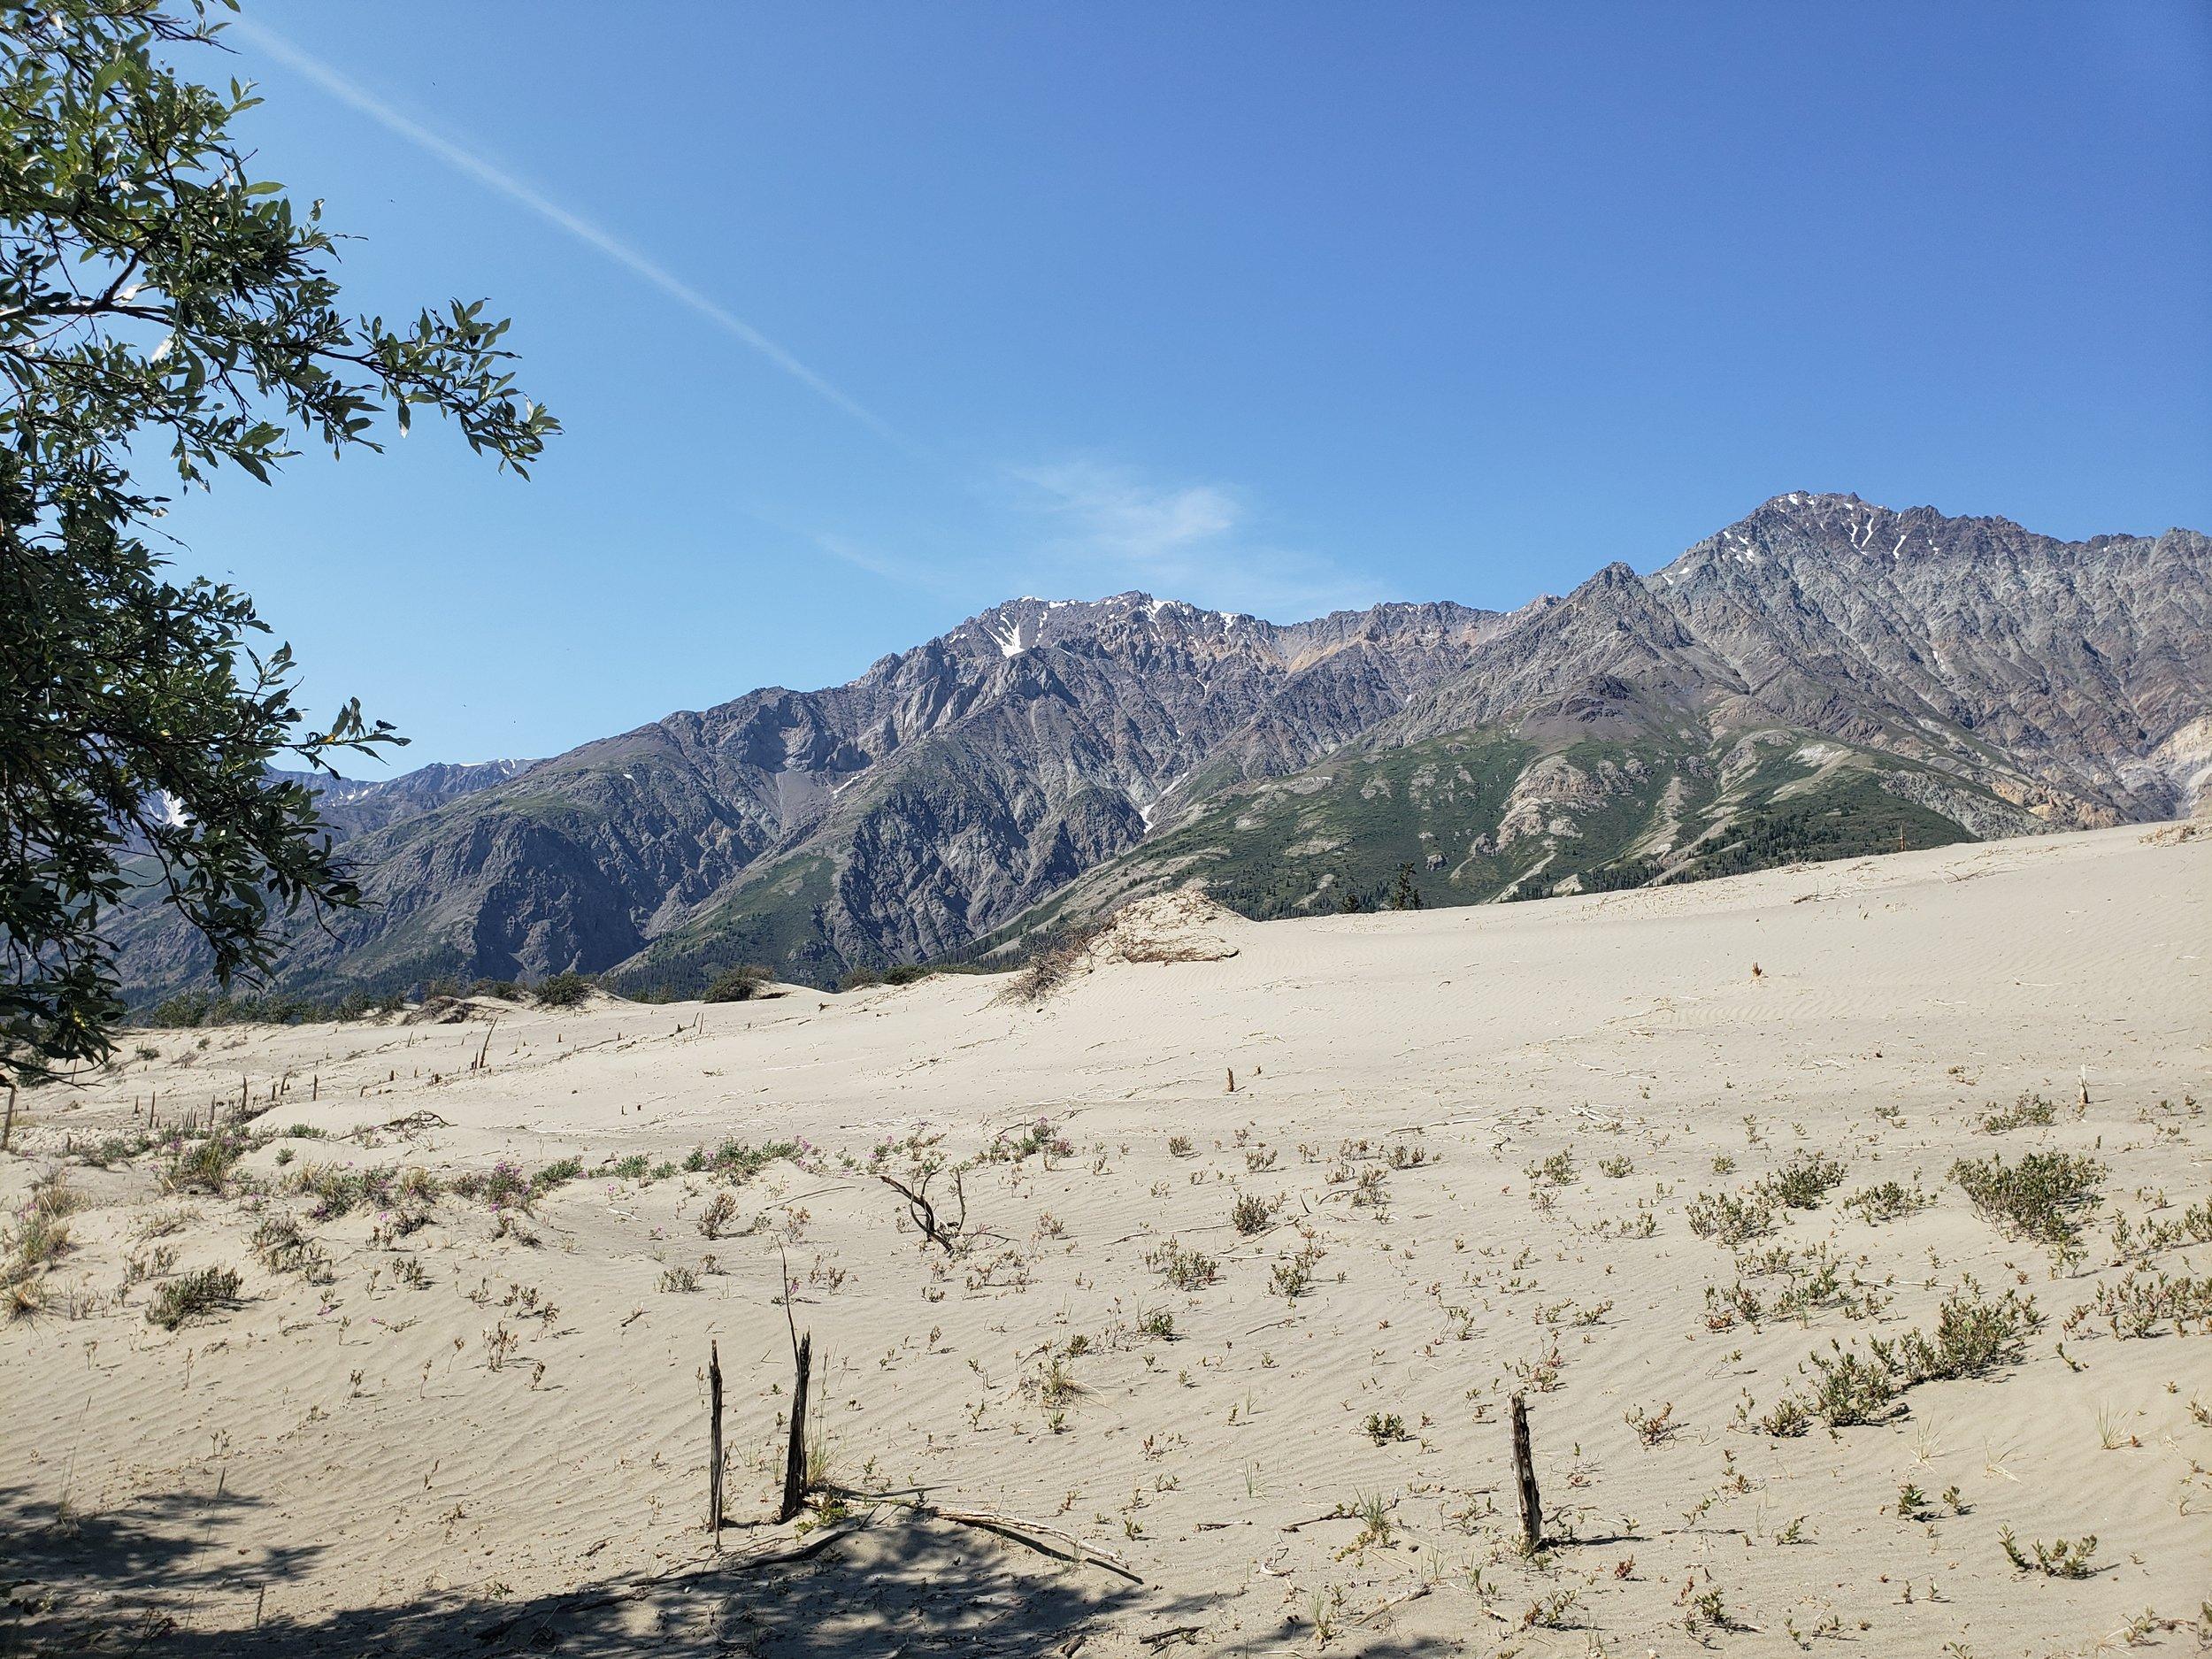 The sand dunes made us feel like we were walking on the beach.